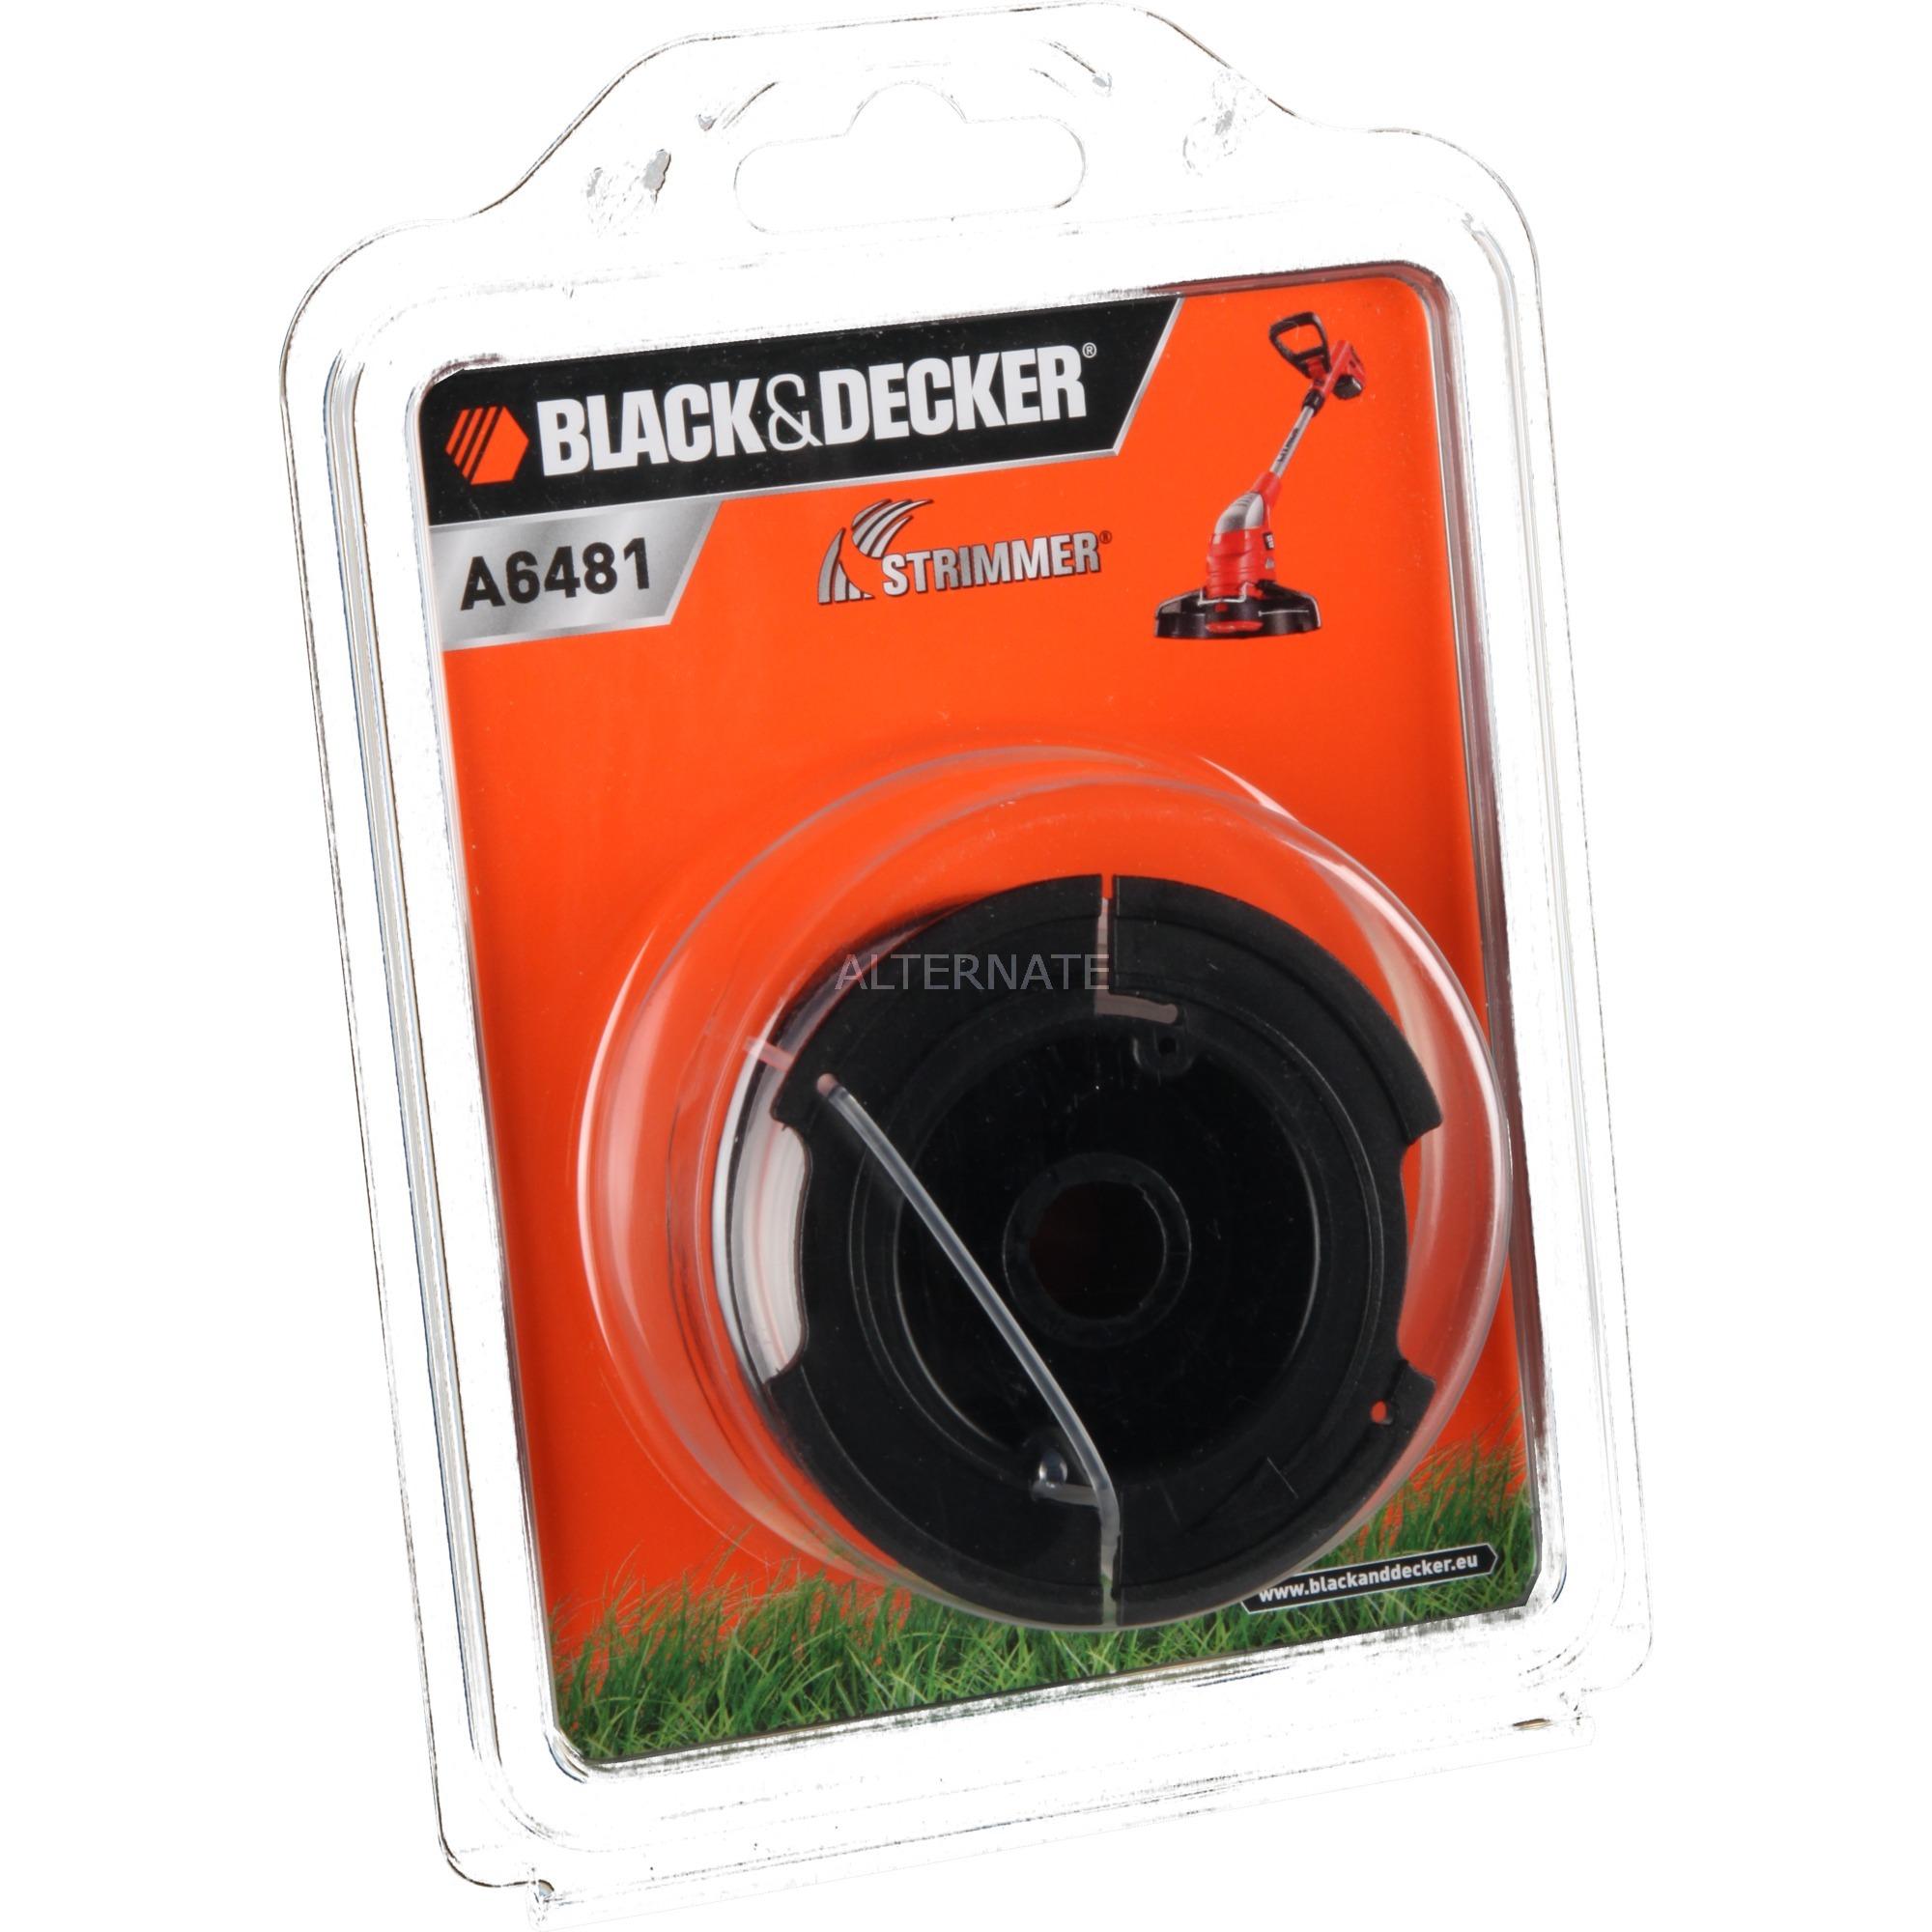 A6481 string trimmer accessories, Hilo de Mackie